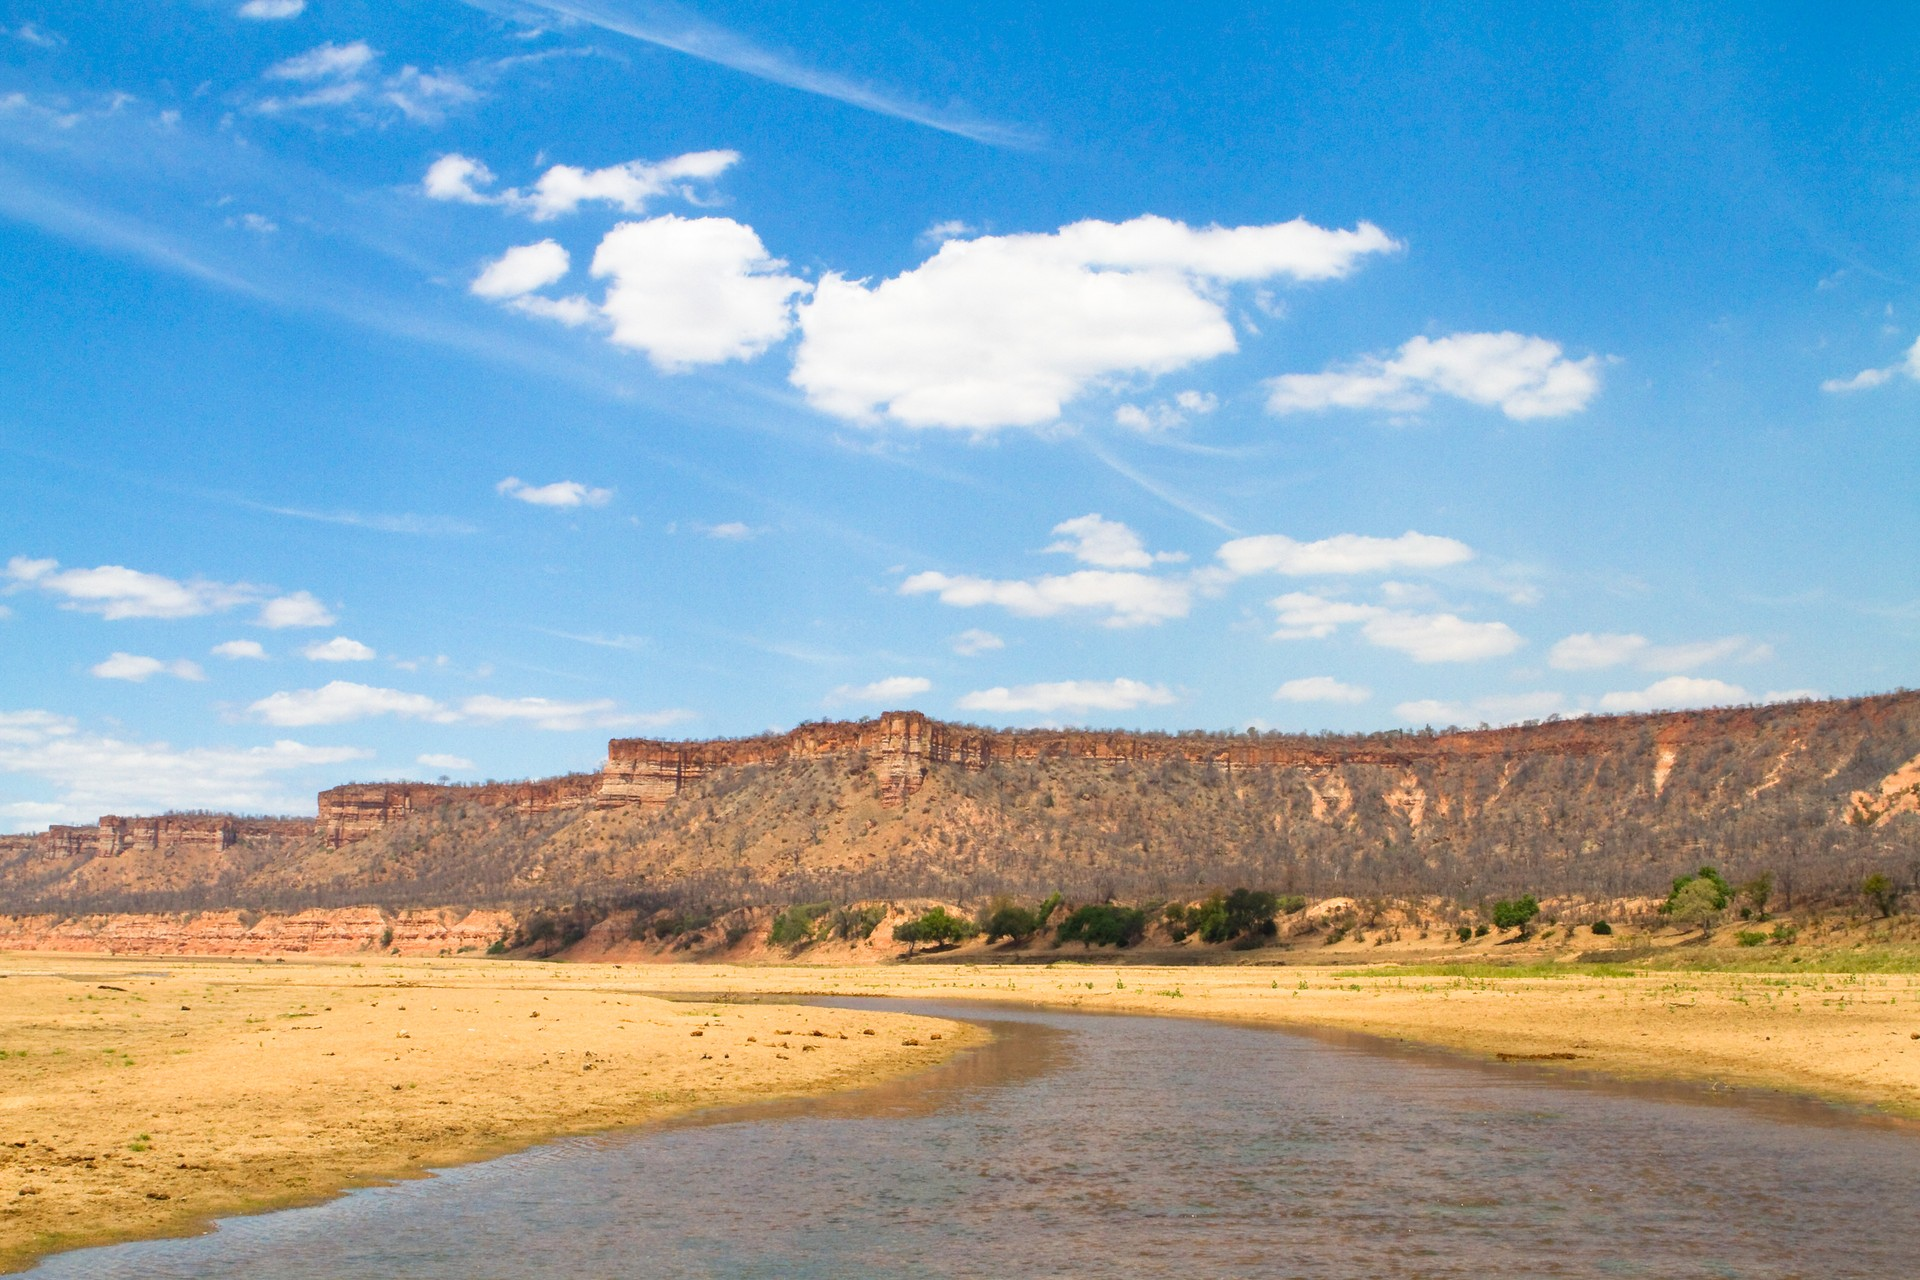 Zimbabwe's best natural attractions: Chiolojo Cliffs